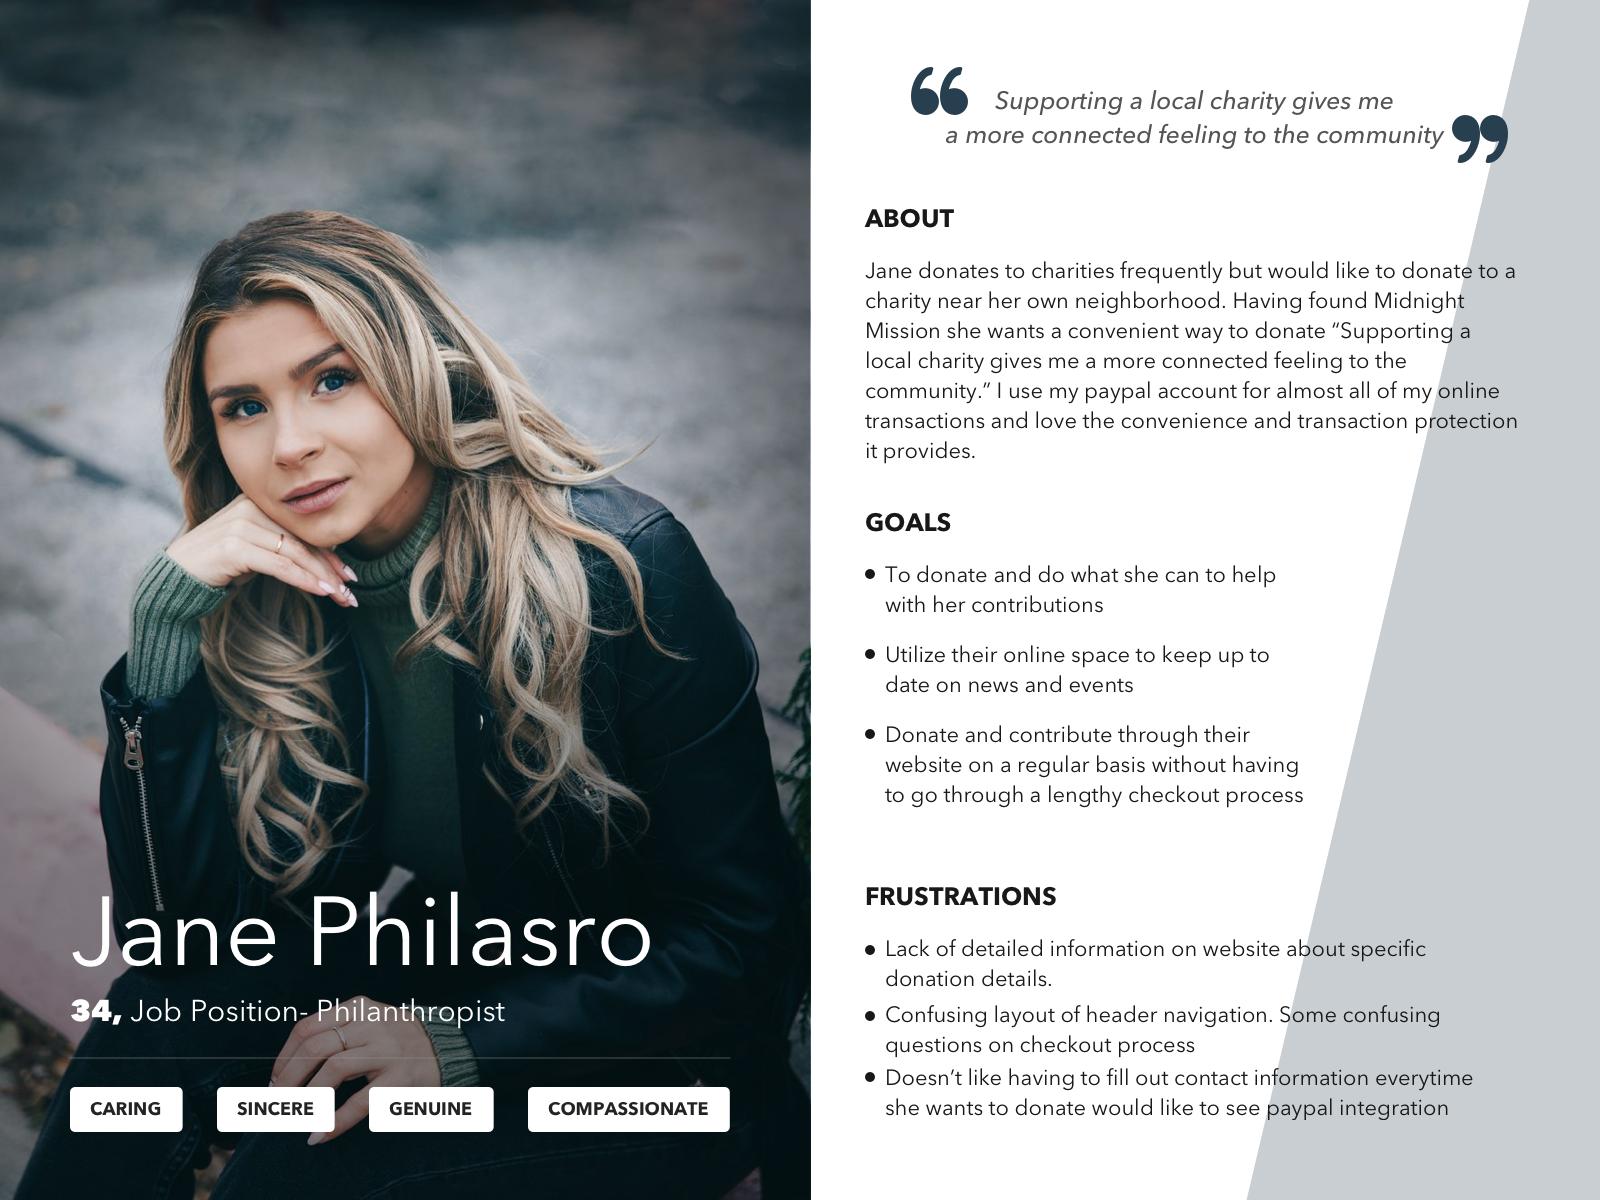 Persona 2 Jane Philasro.png